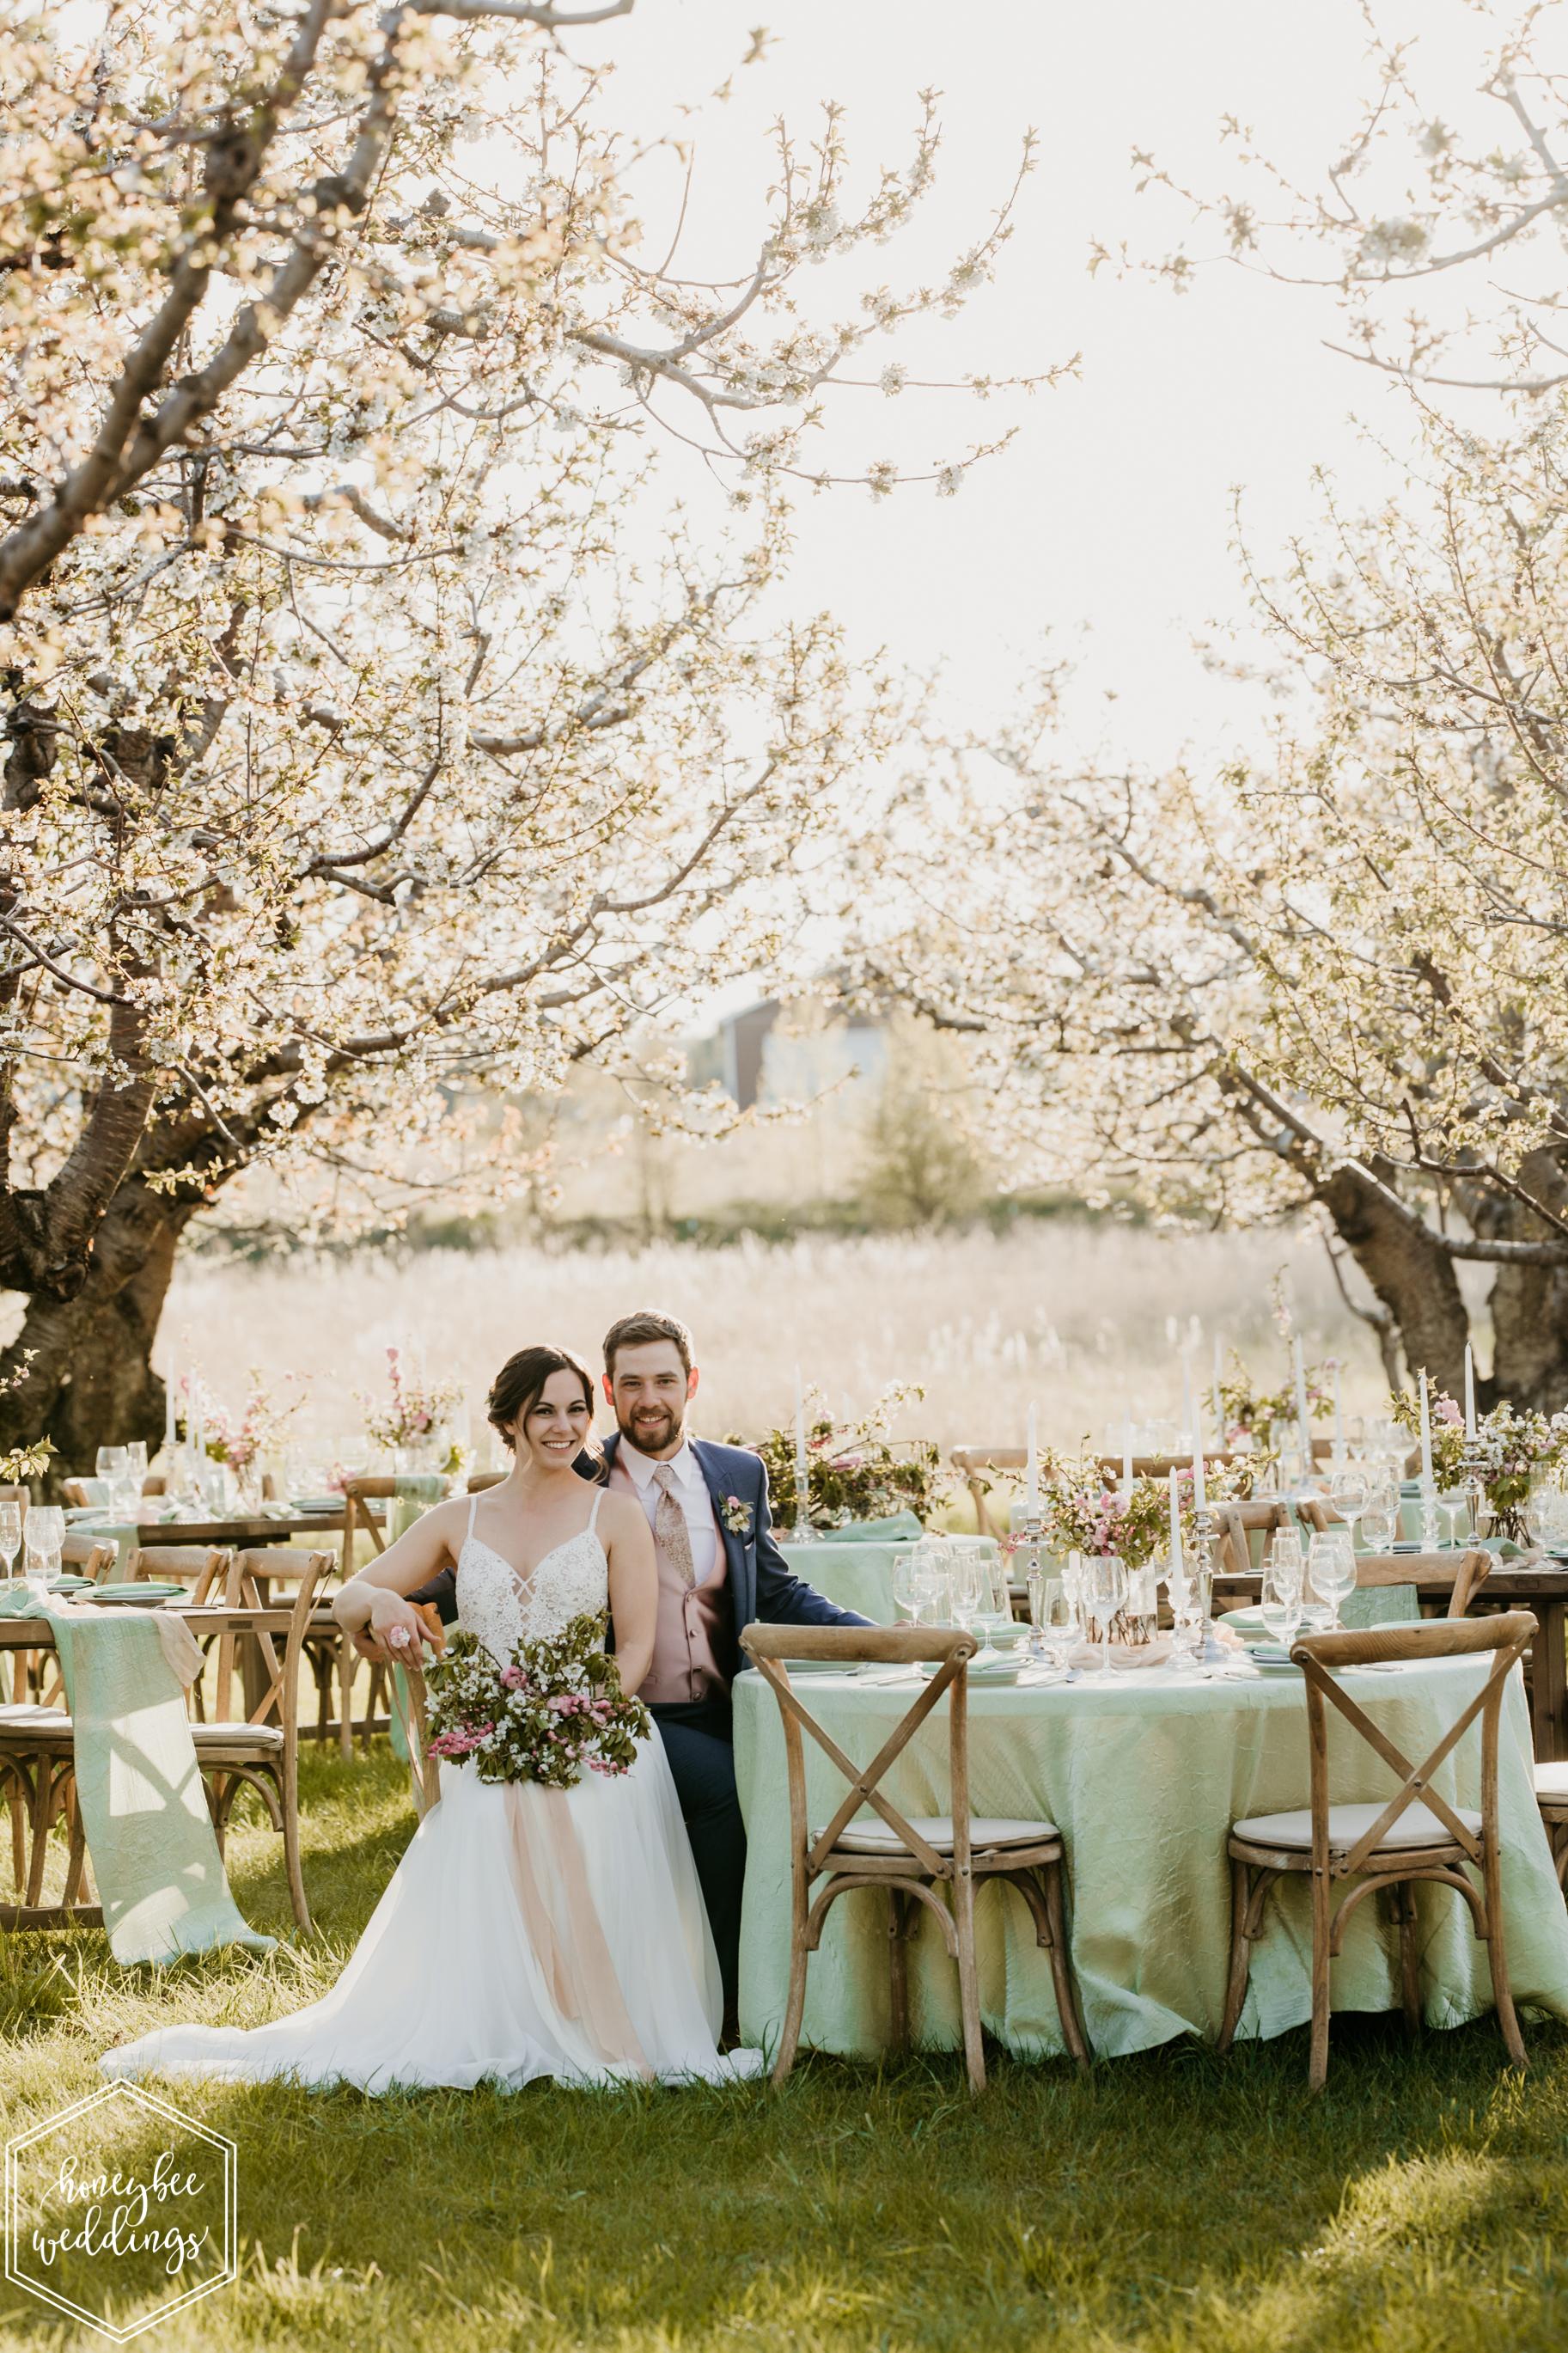 110Cherry Blossom Wedding_Styled Photoshoot_Honeybee Weddings_May 11, 2019-572.jpg